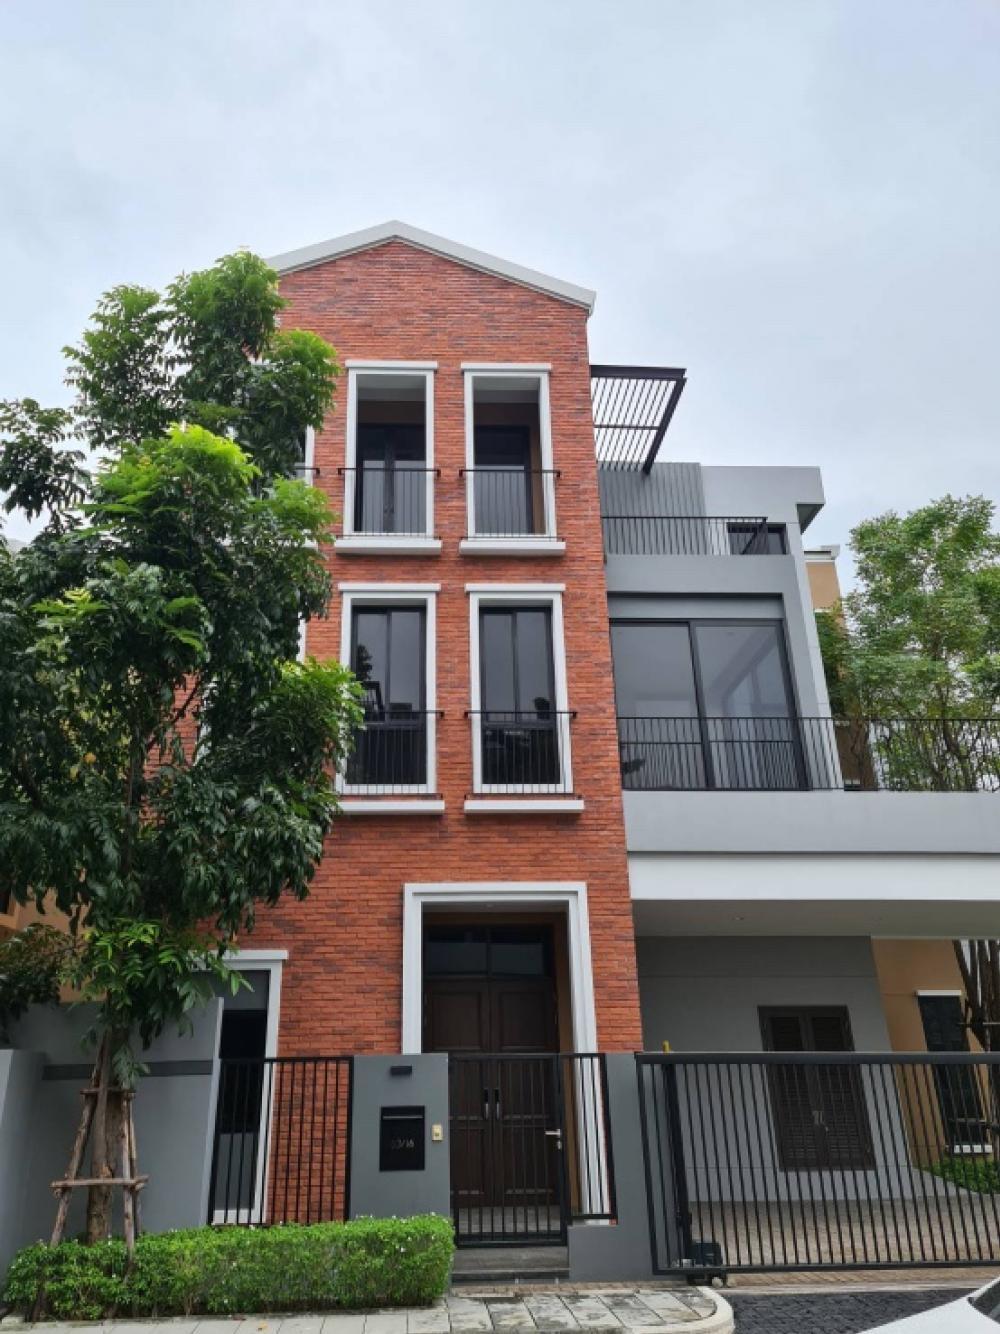 For SaleHouseKaset Nawamin,Ladplakao : Quick sale! Artale House, Artale Kaset-Nawamin, 390 sq m, 54 sq m, price 23.9 million baht, very beautiful.